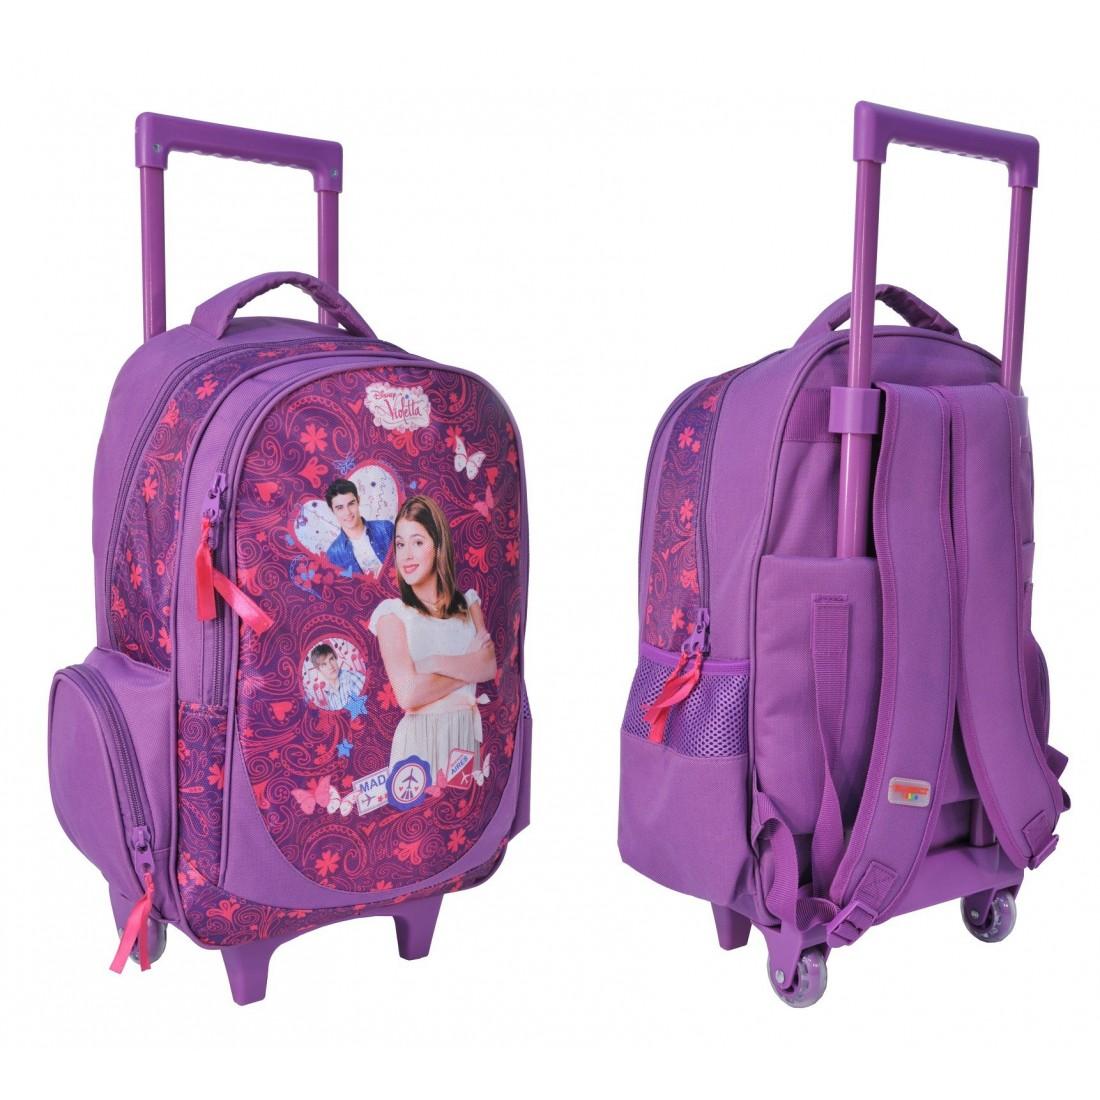 Plecak na kółkach Violetta - plecak-tornister.pl